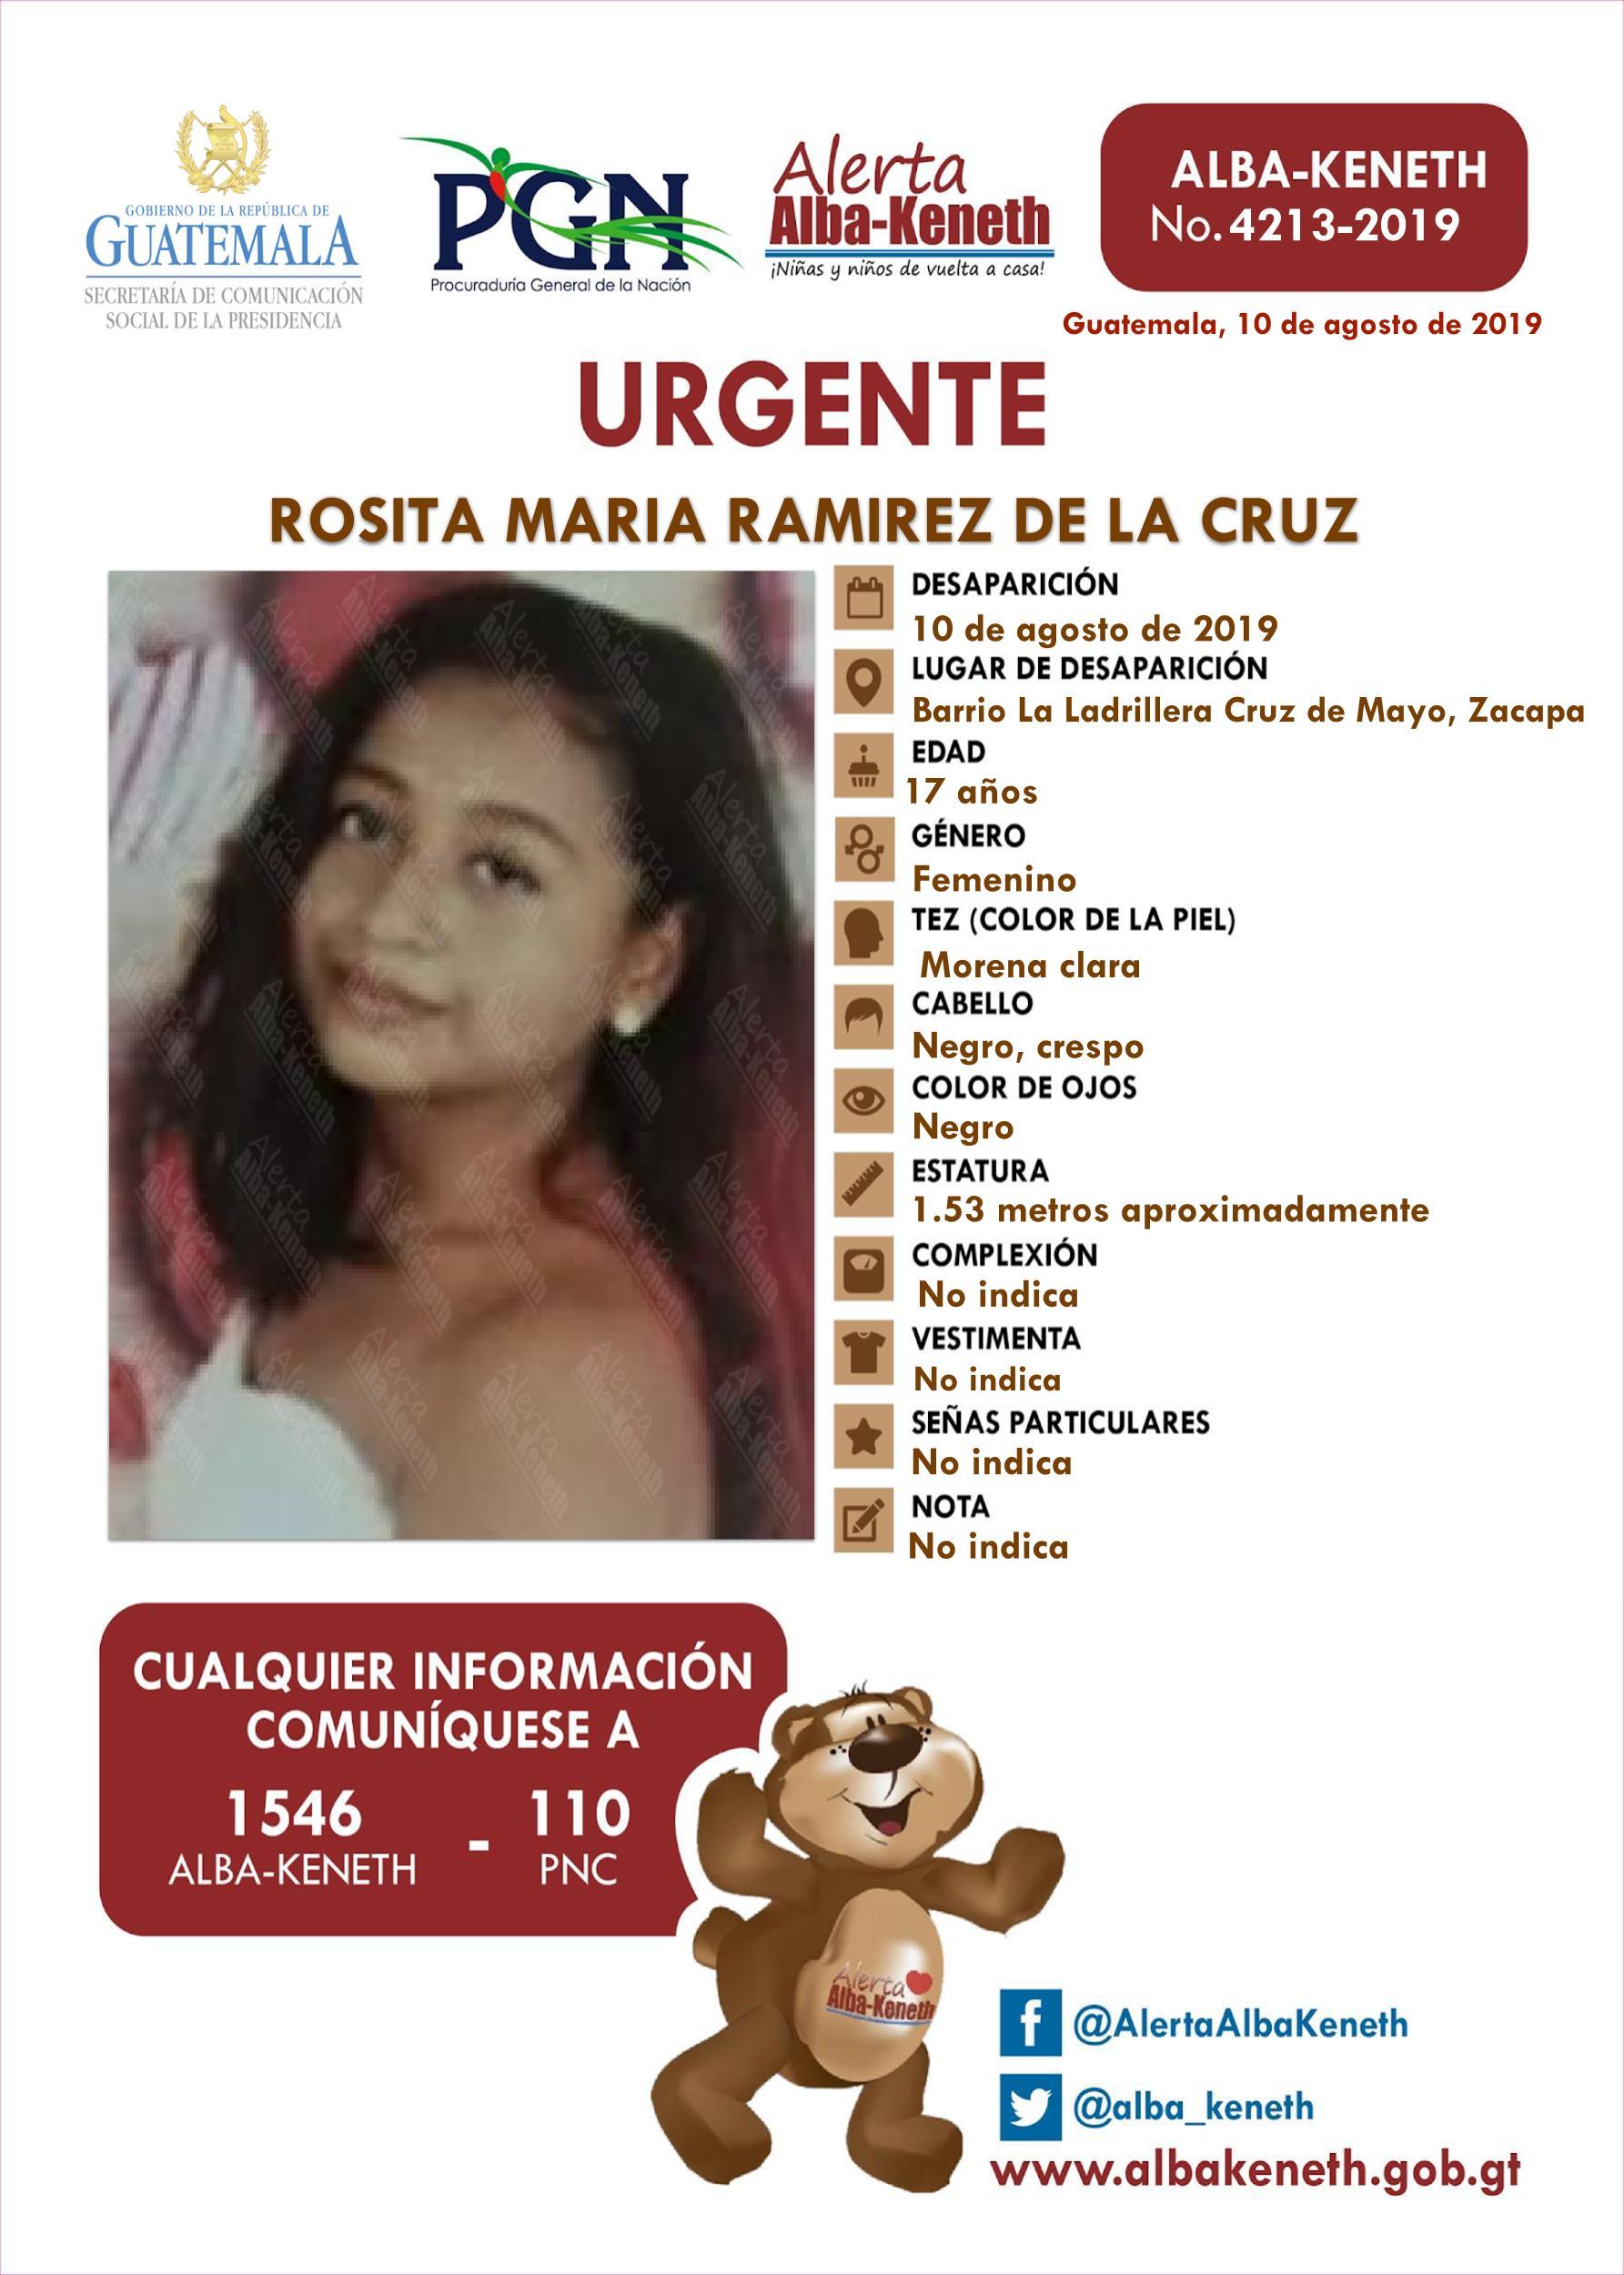 Rosita Maria Ramirez de la Cruz